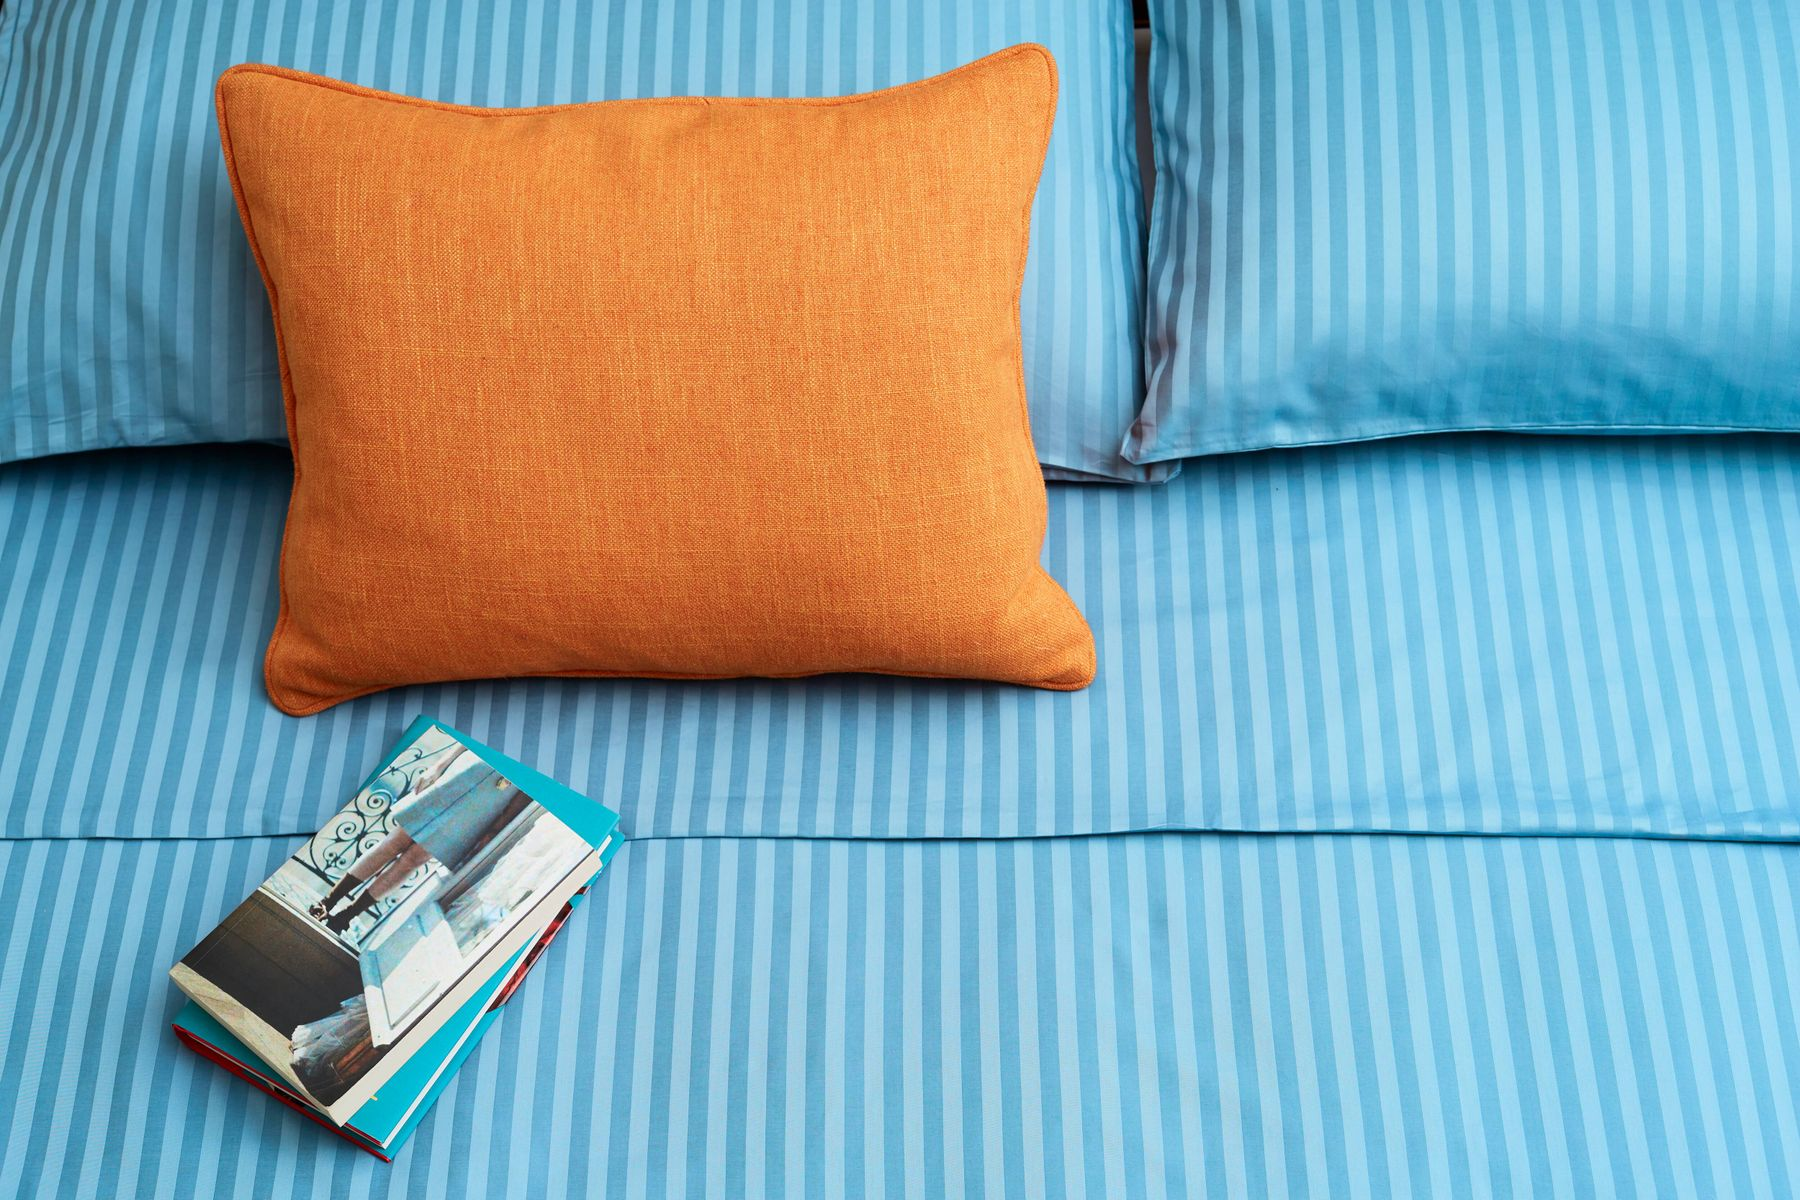 orange cushion on a blue sofa